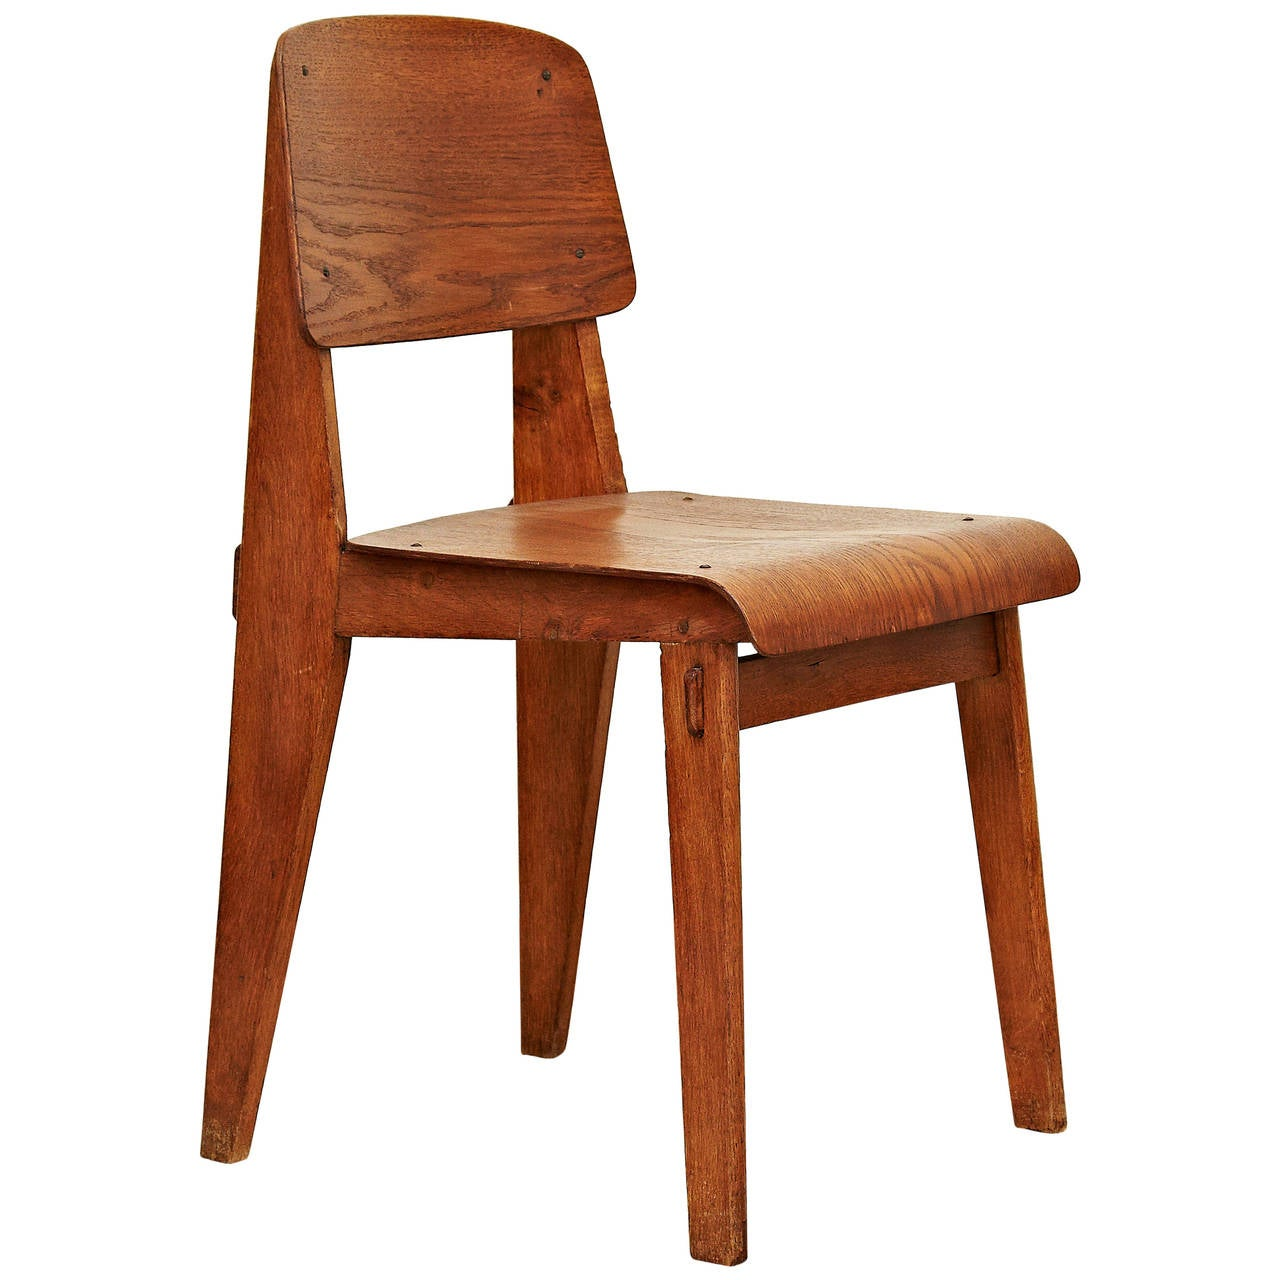 Jean Prouvu00e9 Standard Chair u0026quot;Tout Boisu0026quot;, 1941 at 1stdibs